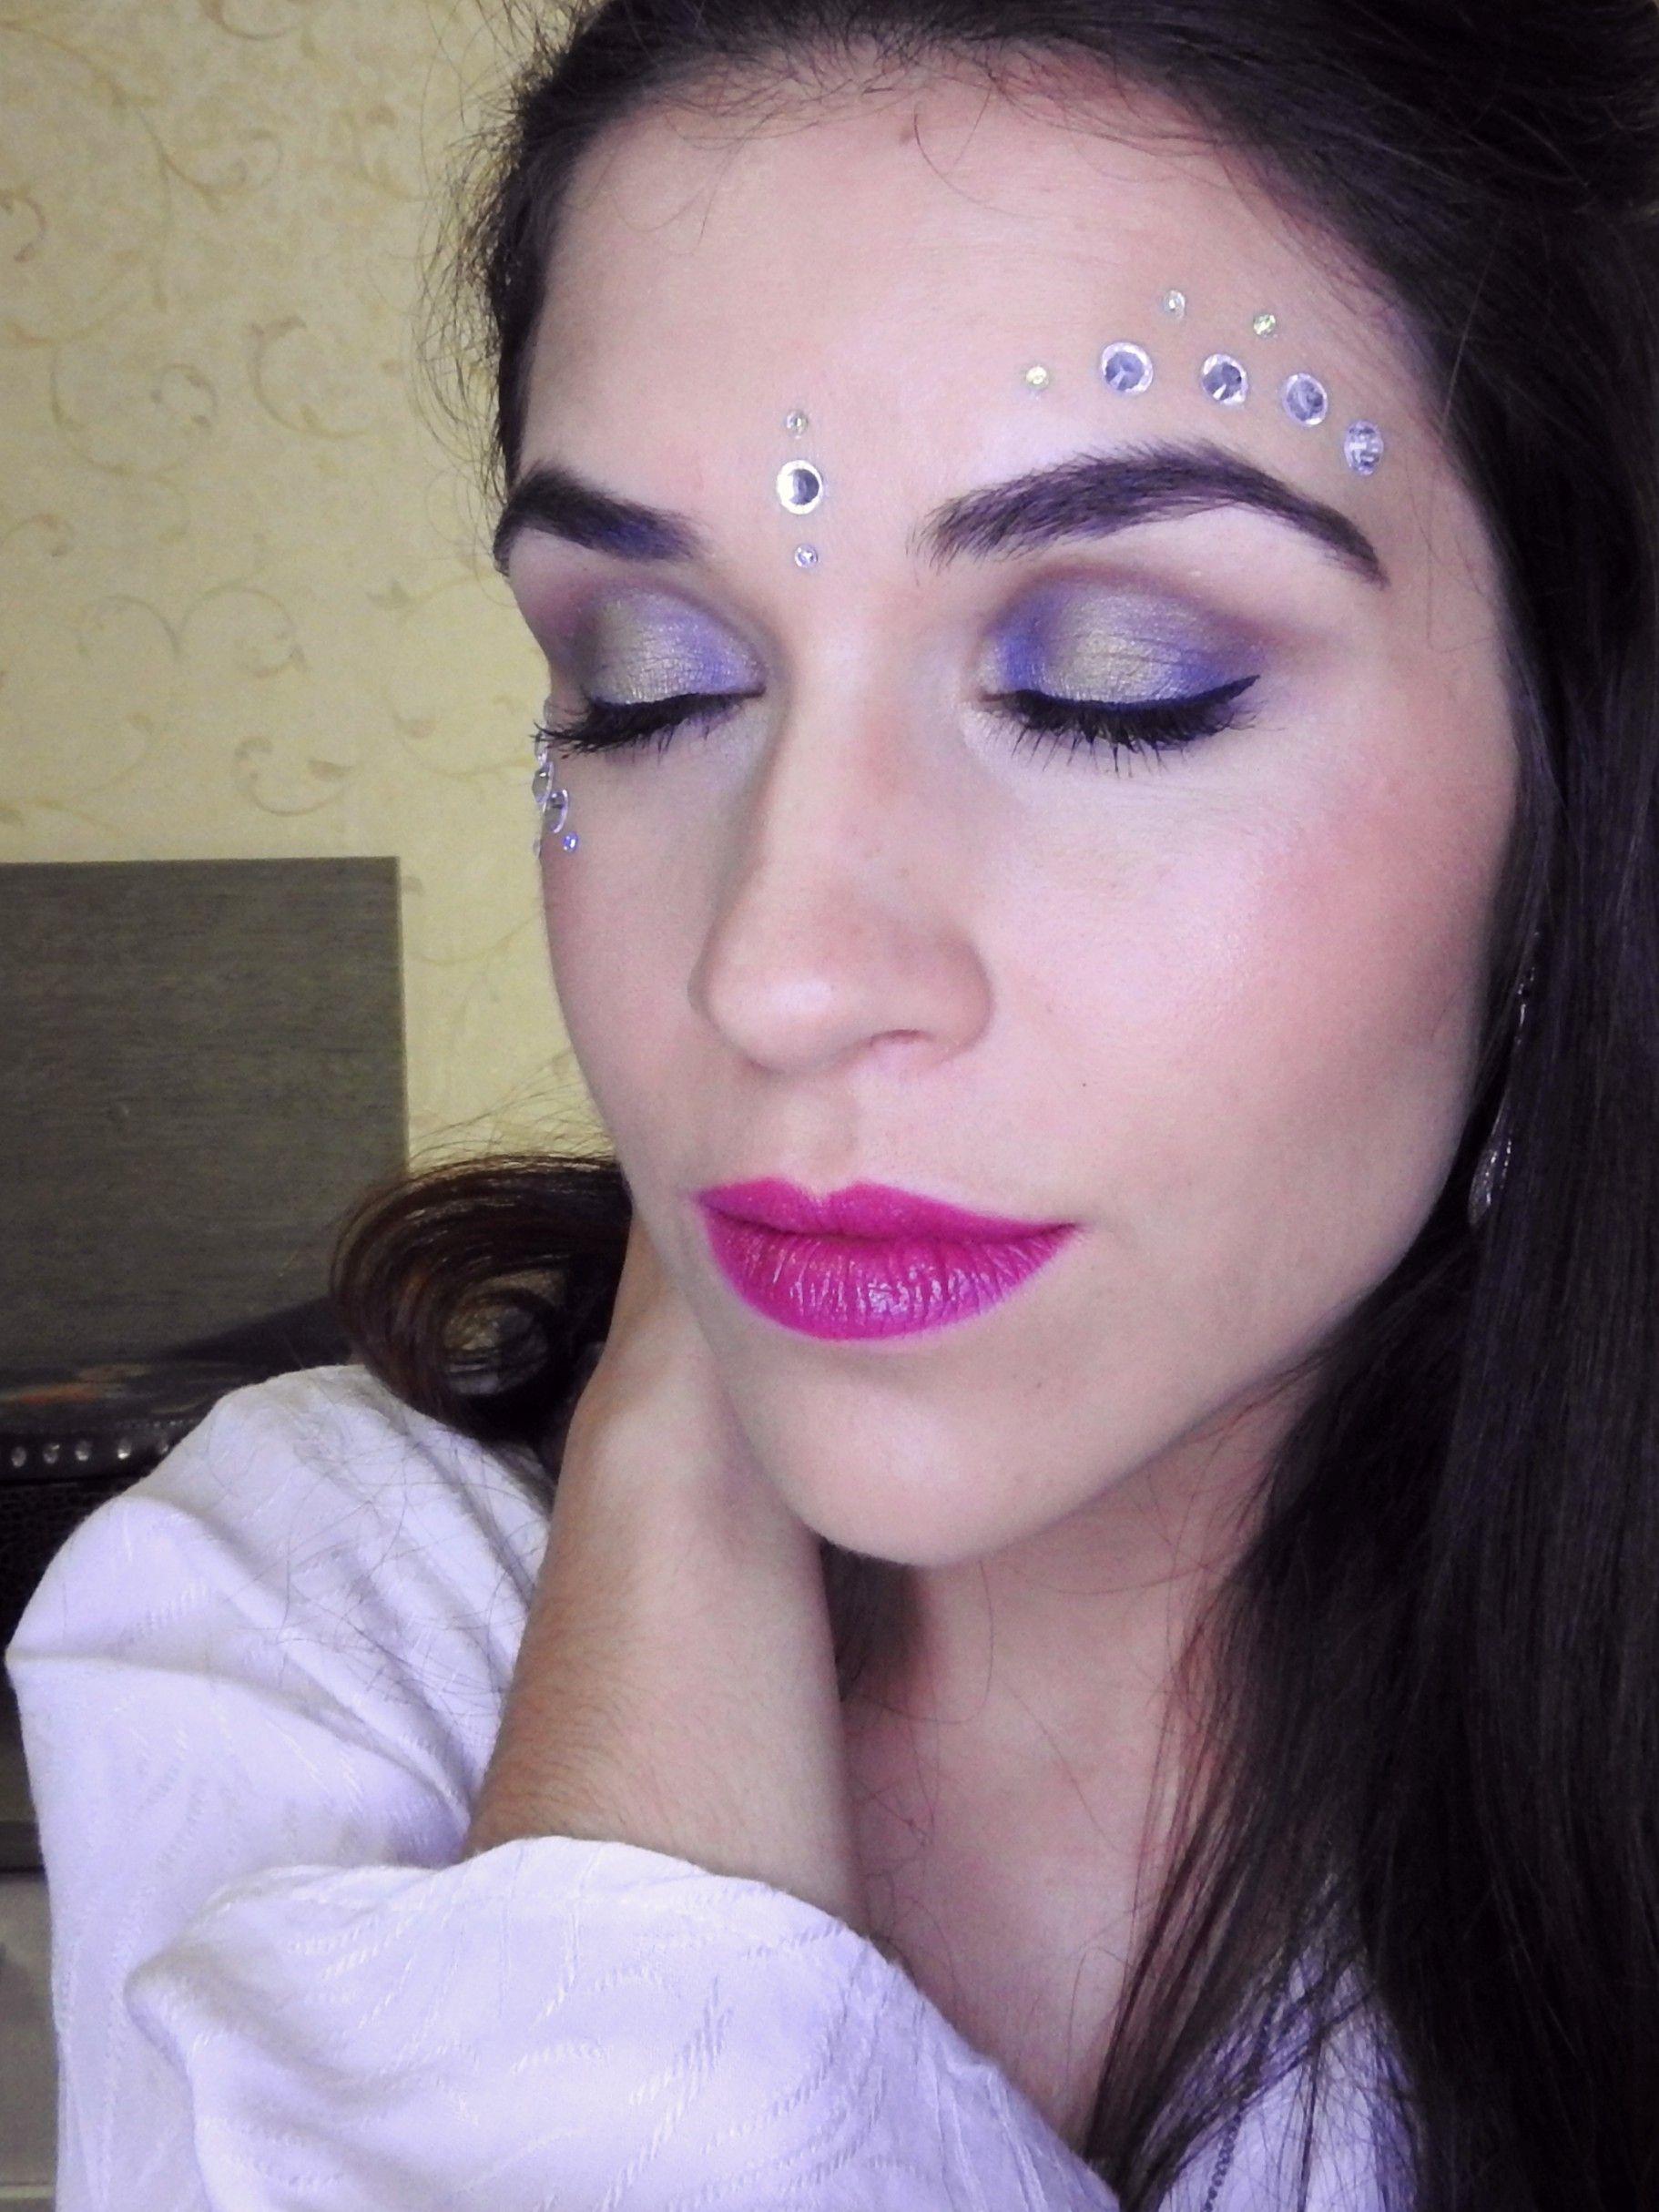 Maquiagem utilizando a técnica de pálpebra luz. #maquiagem #makeup #maquiagemartística #artisticmakeup #maquiagemfesta #makefesta #makecombrilho